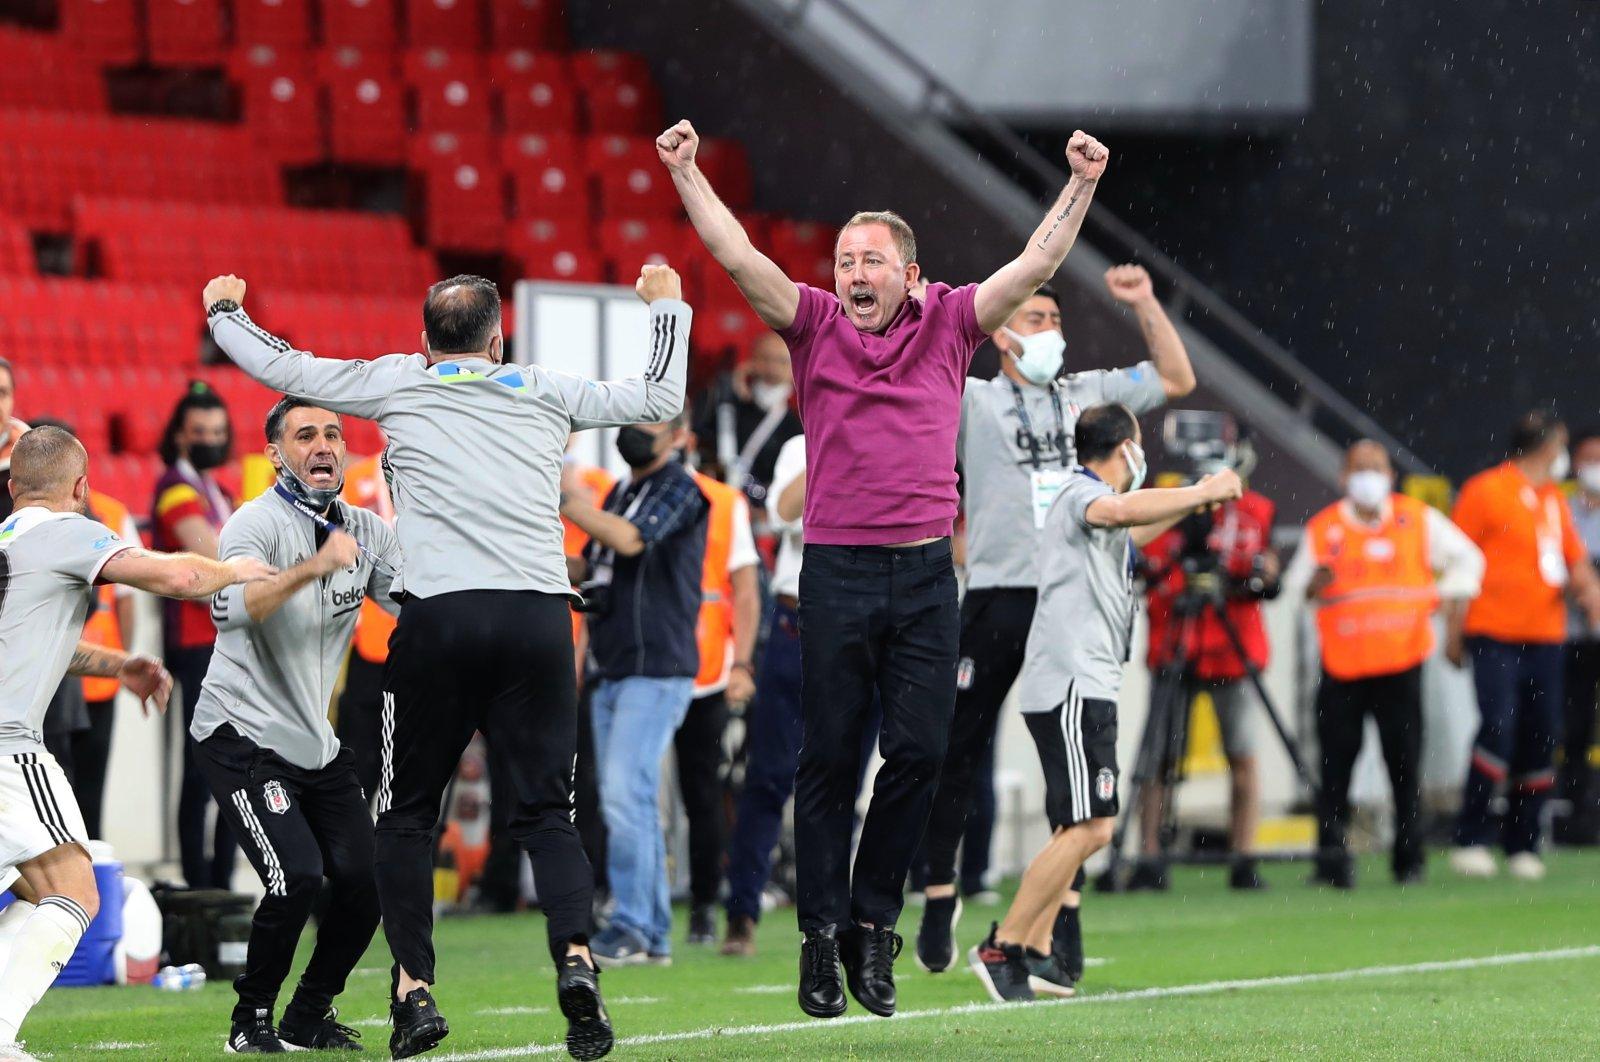 Beşiktaş coach Sergen Yalçın (C) and support staff celebrate winning the Turkish Süper Lig title, Izmir, Turkey, May 15, 2021. (AA Photo)